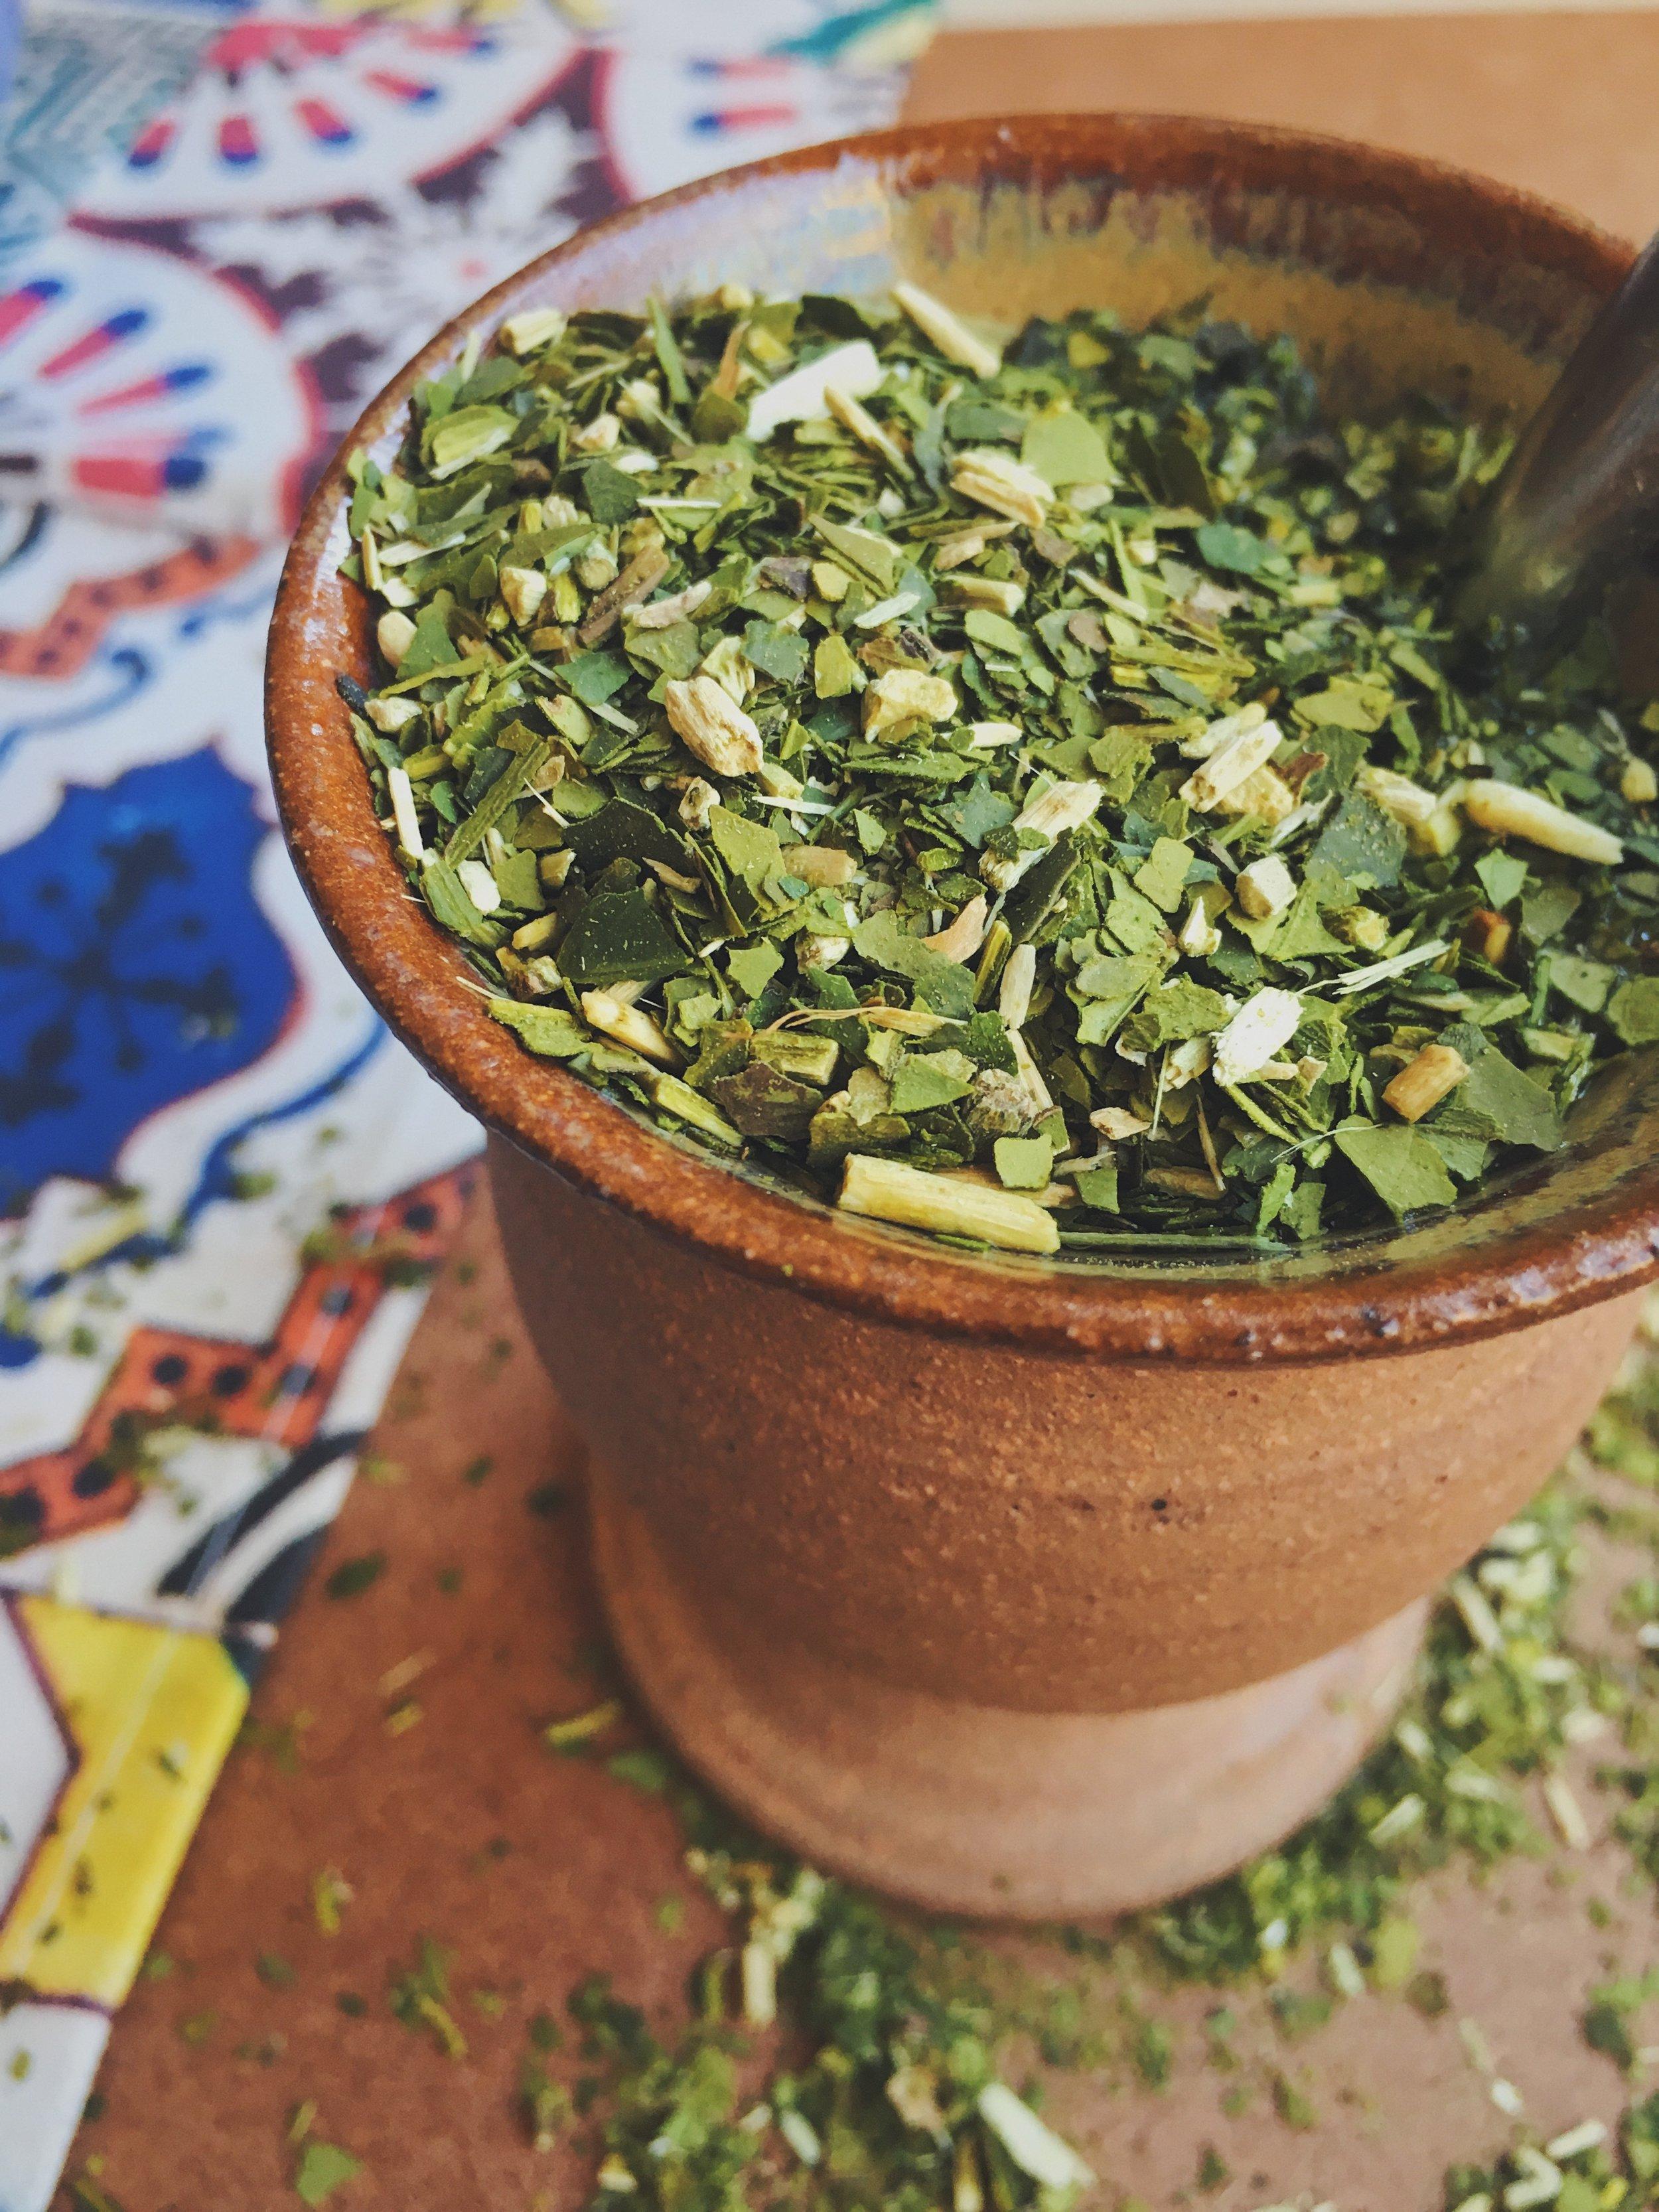 yerba maté - the drink beyond the drink